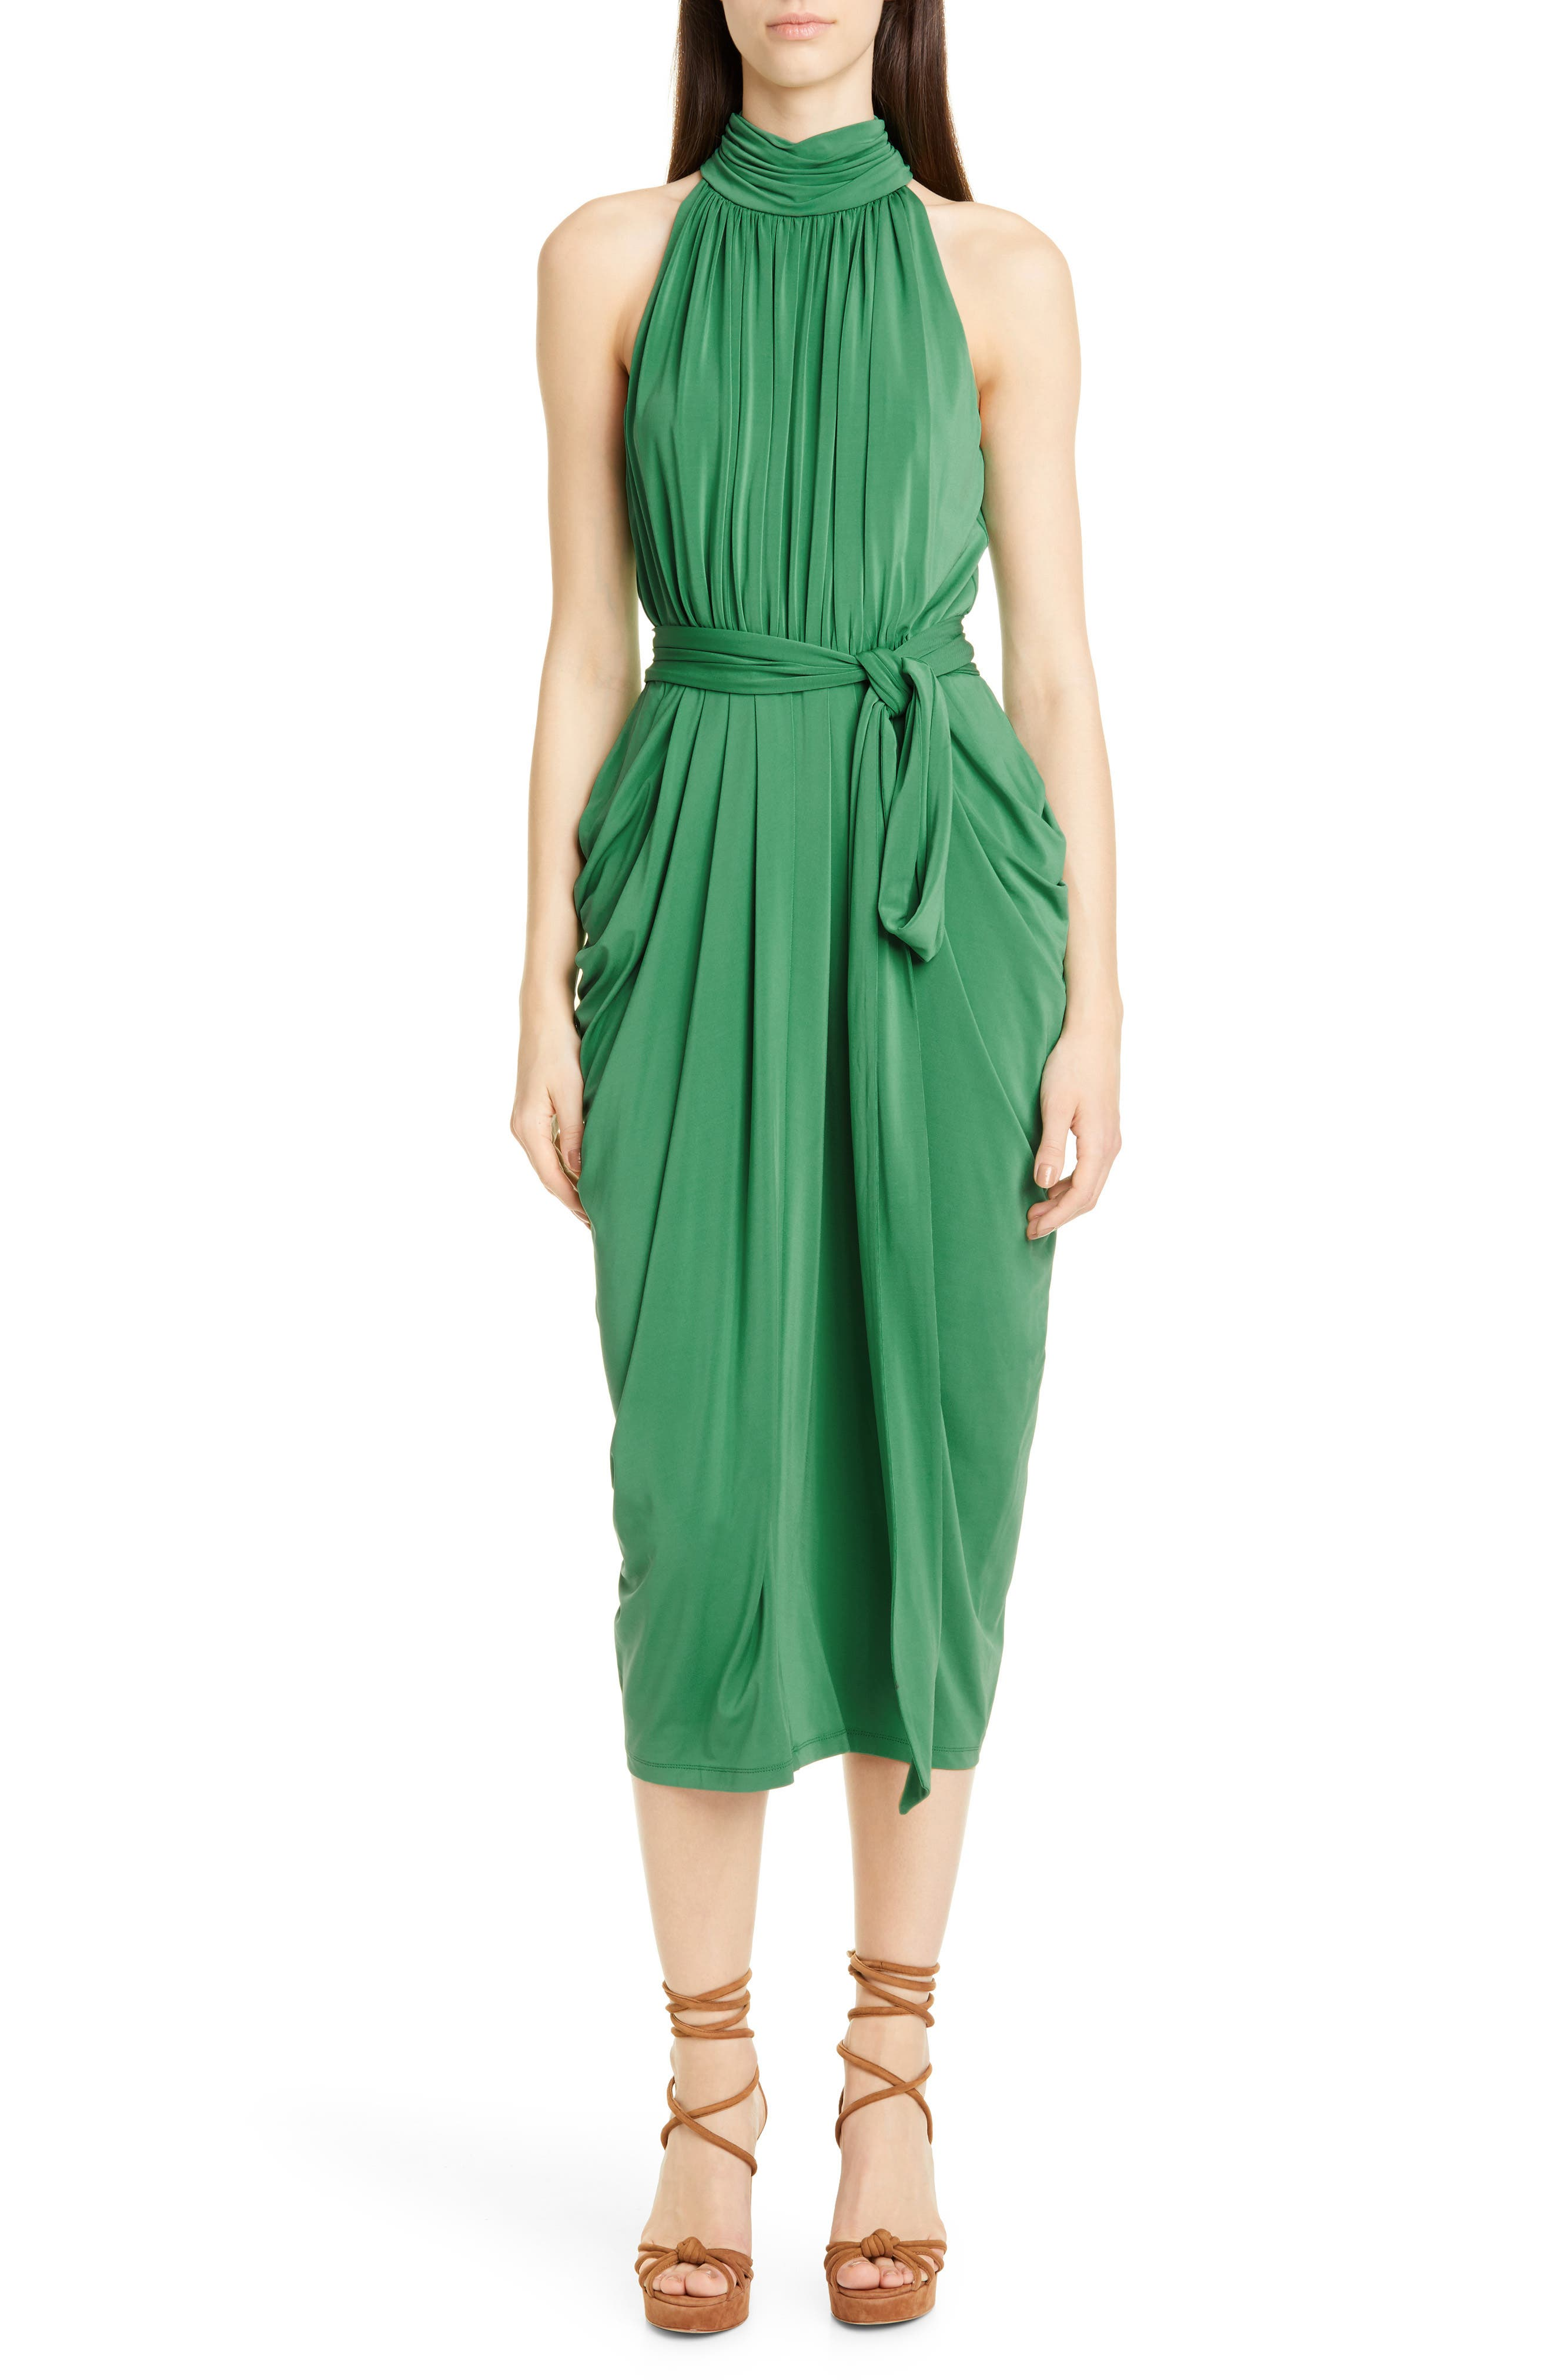 1960s – 70s Cocktail, Party, Prom, Evening Dresses Womens Tommy X Zendaya Halter Neck Drape Midi Dress Size 16 - Green $279.00 AT vintagedancer.com